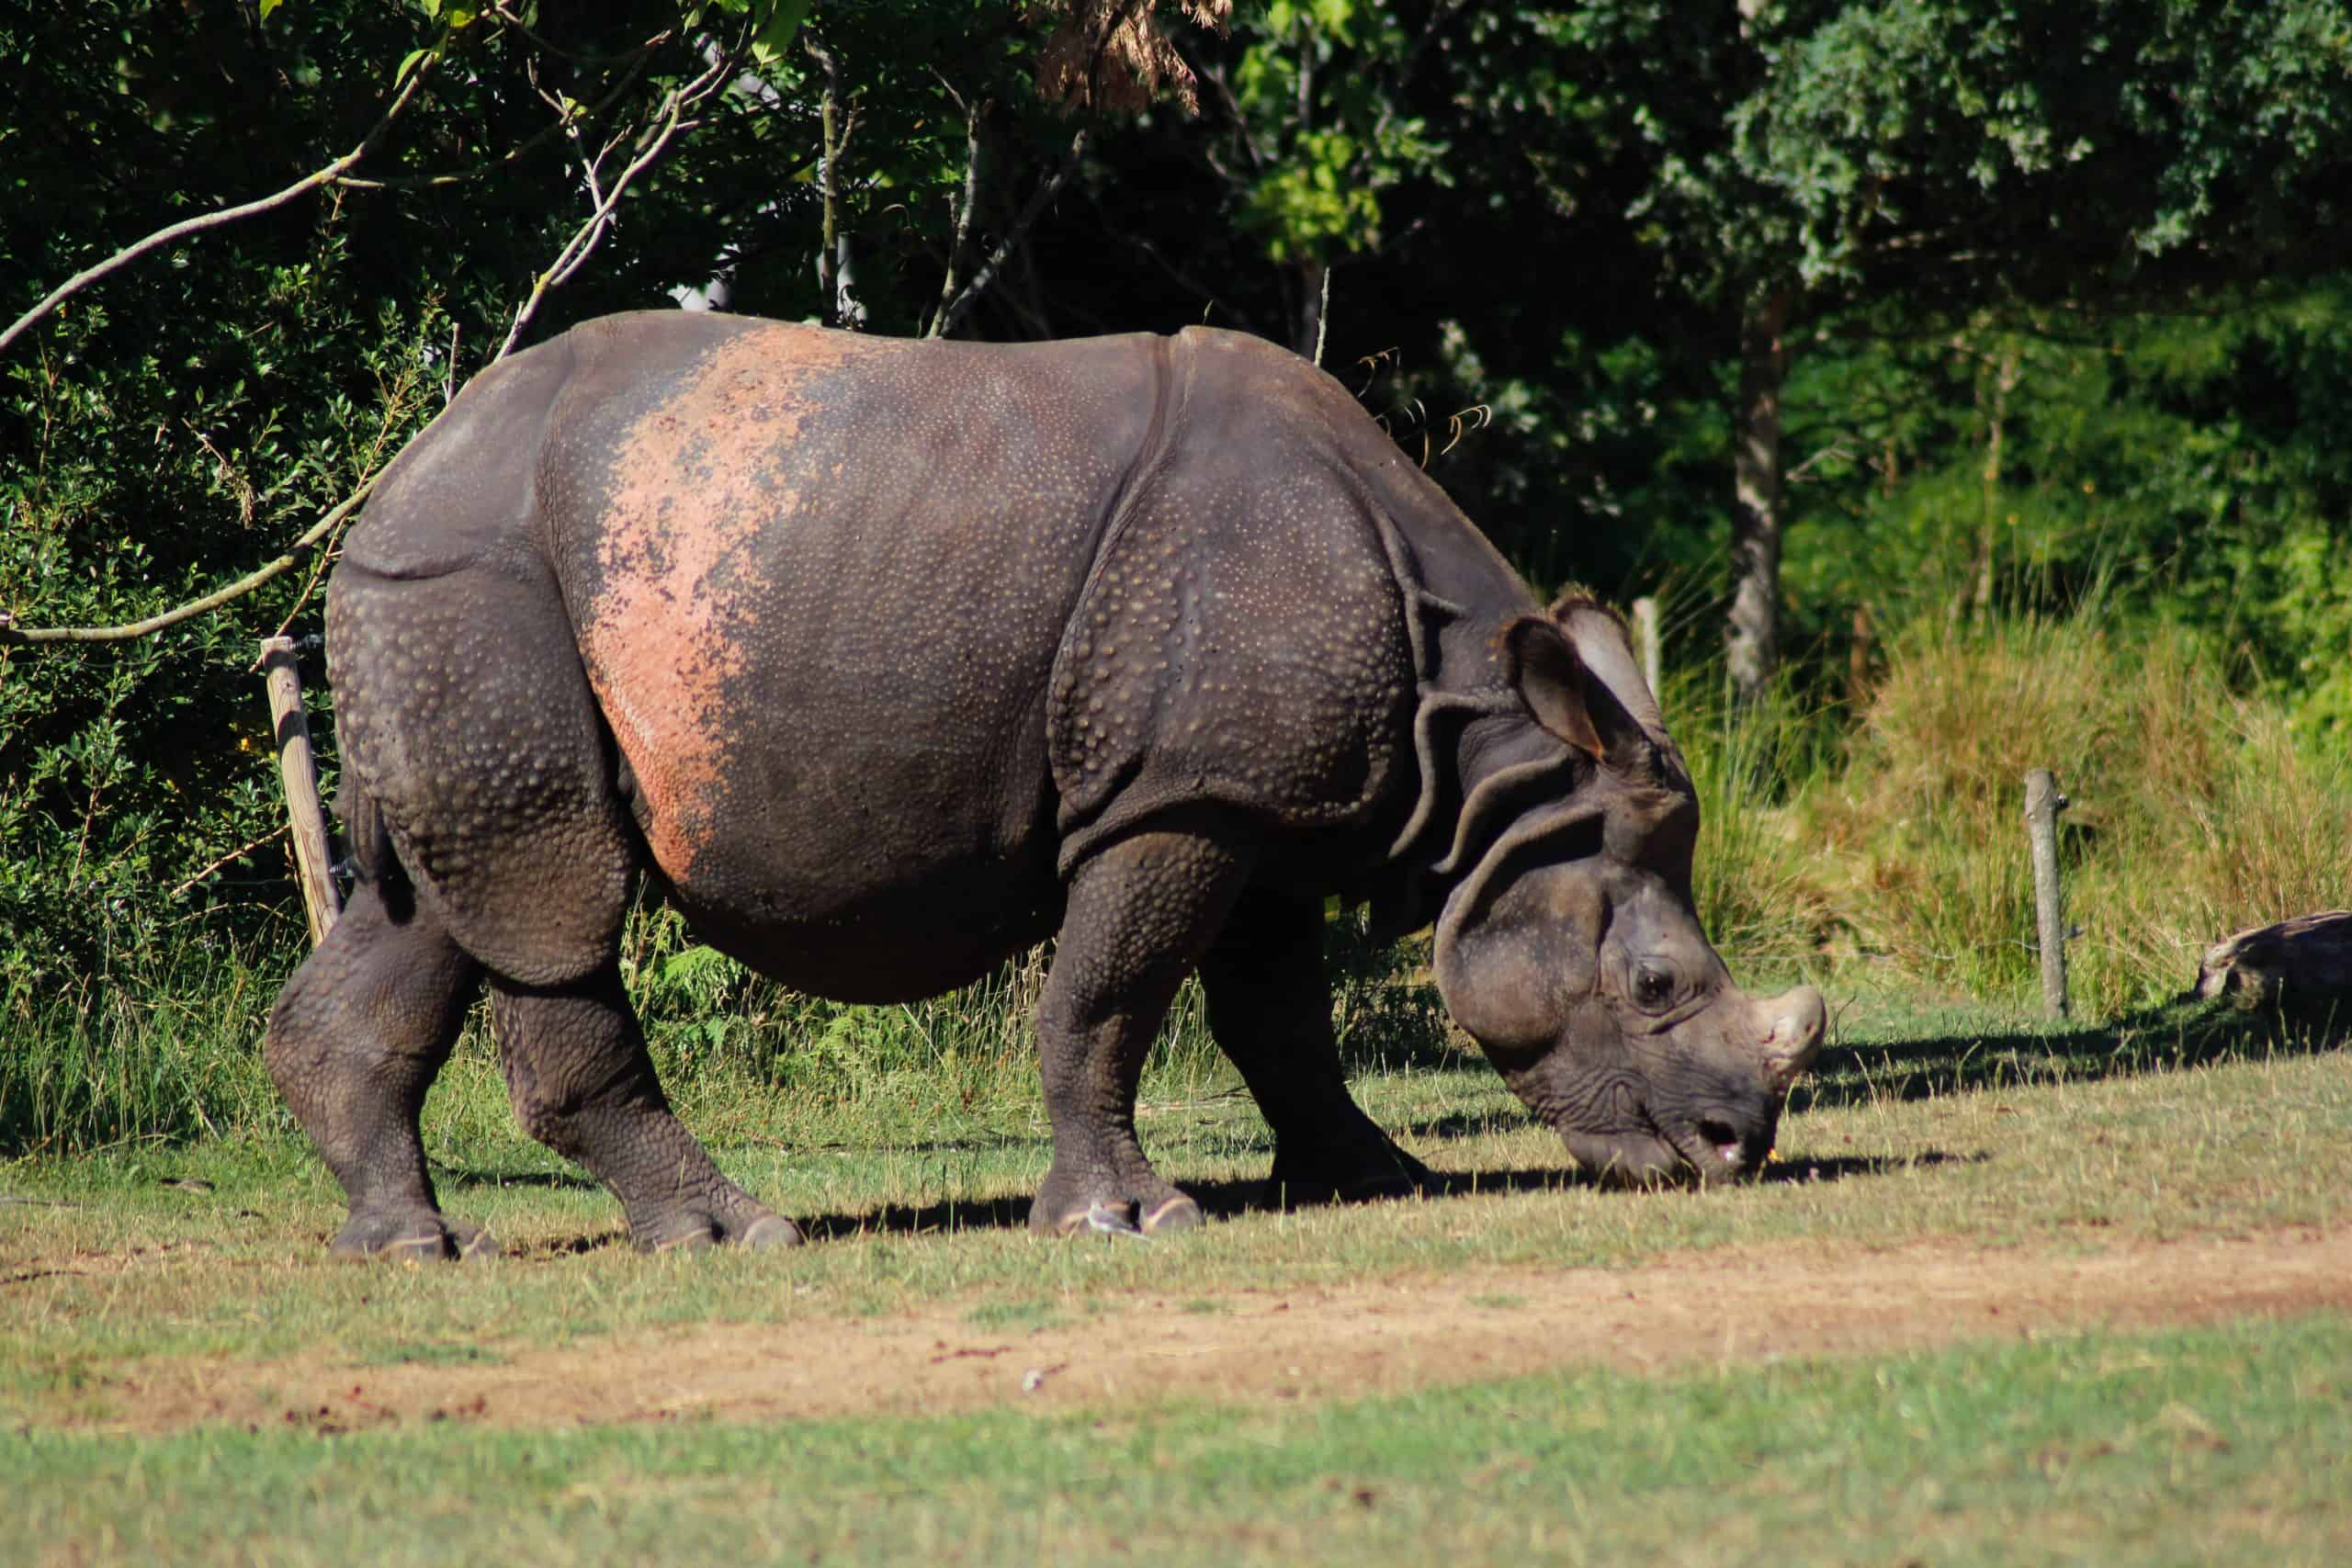 Burigi Chato Safaris Co. Ltd Serengeti Norongoro Safari Best Tour Agency Company Operator In Moshi Arusha Tanzania Africa) (51)